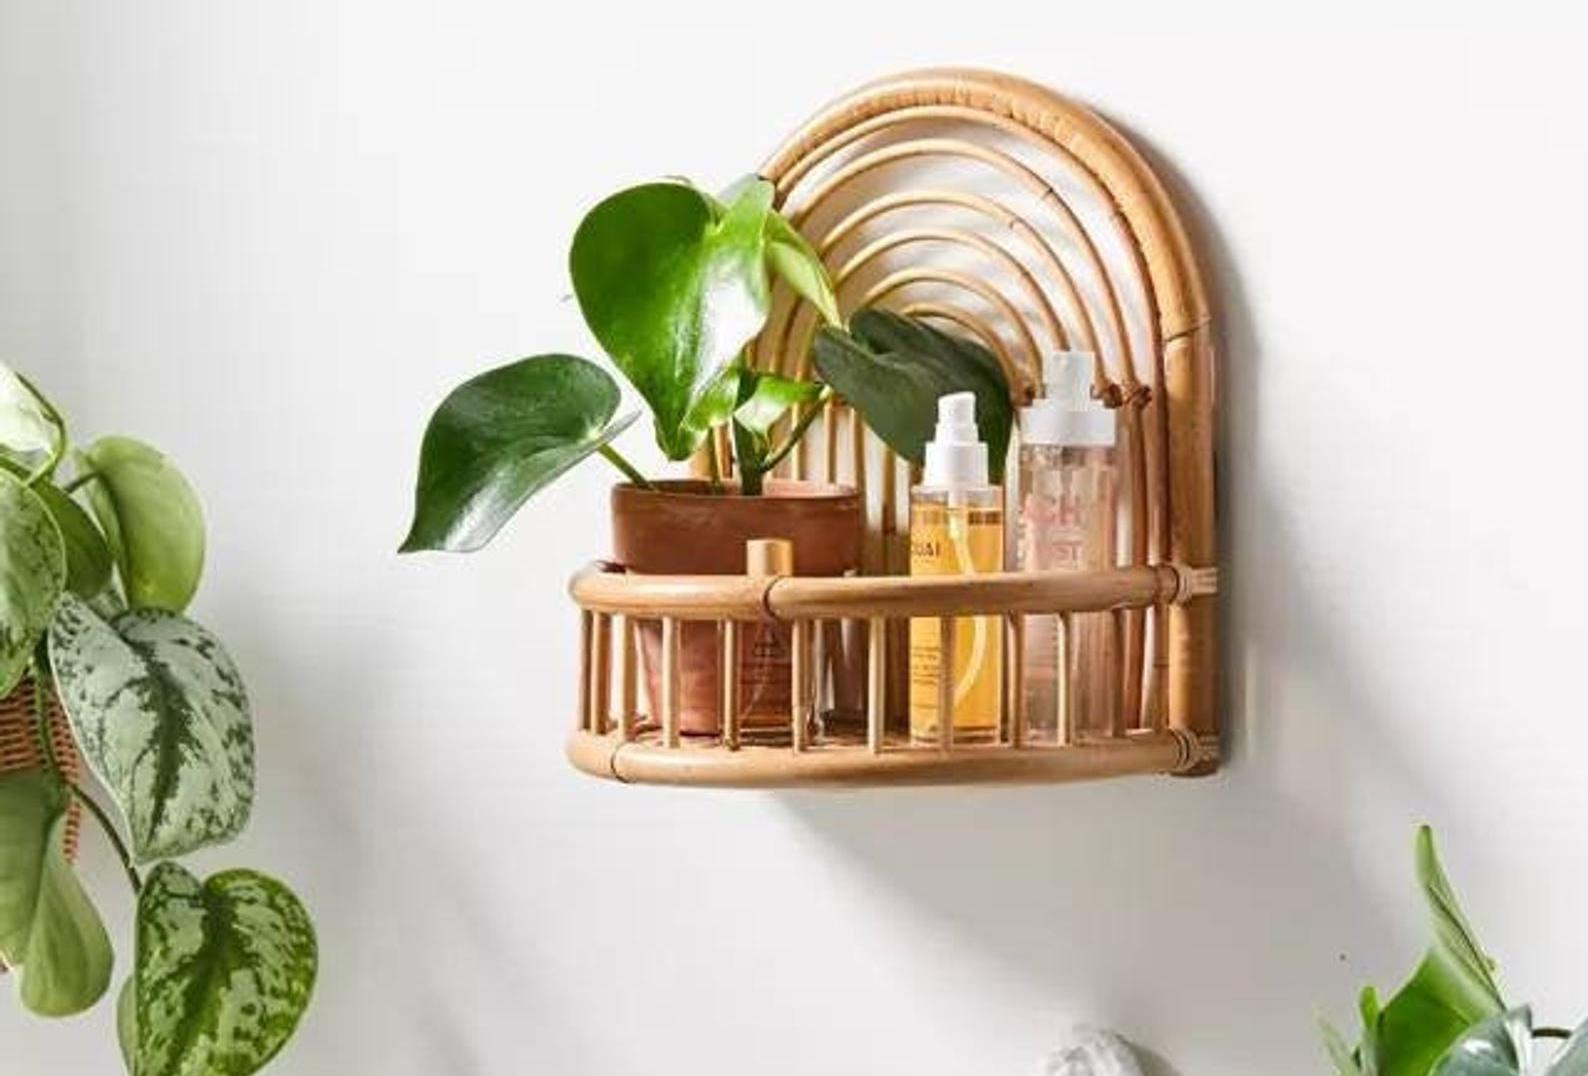 Curved rattan shelf with matching rattan headboard